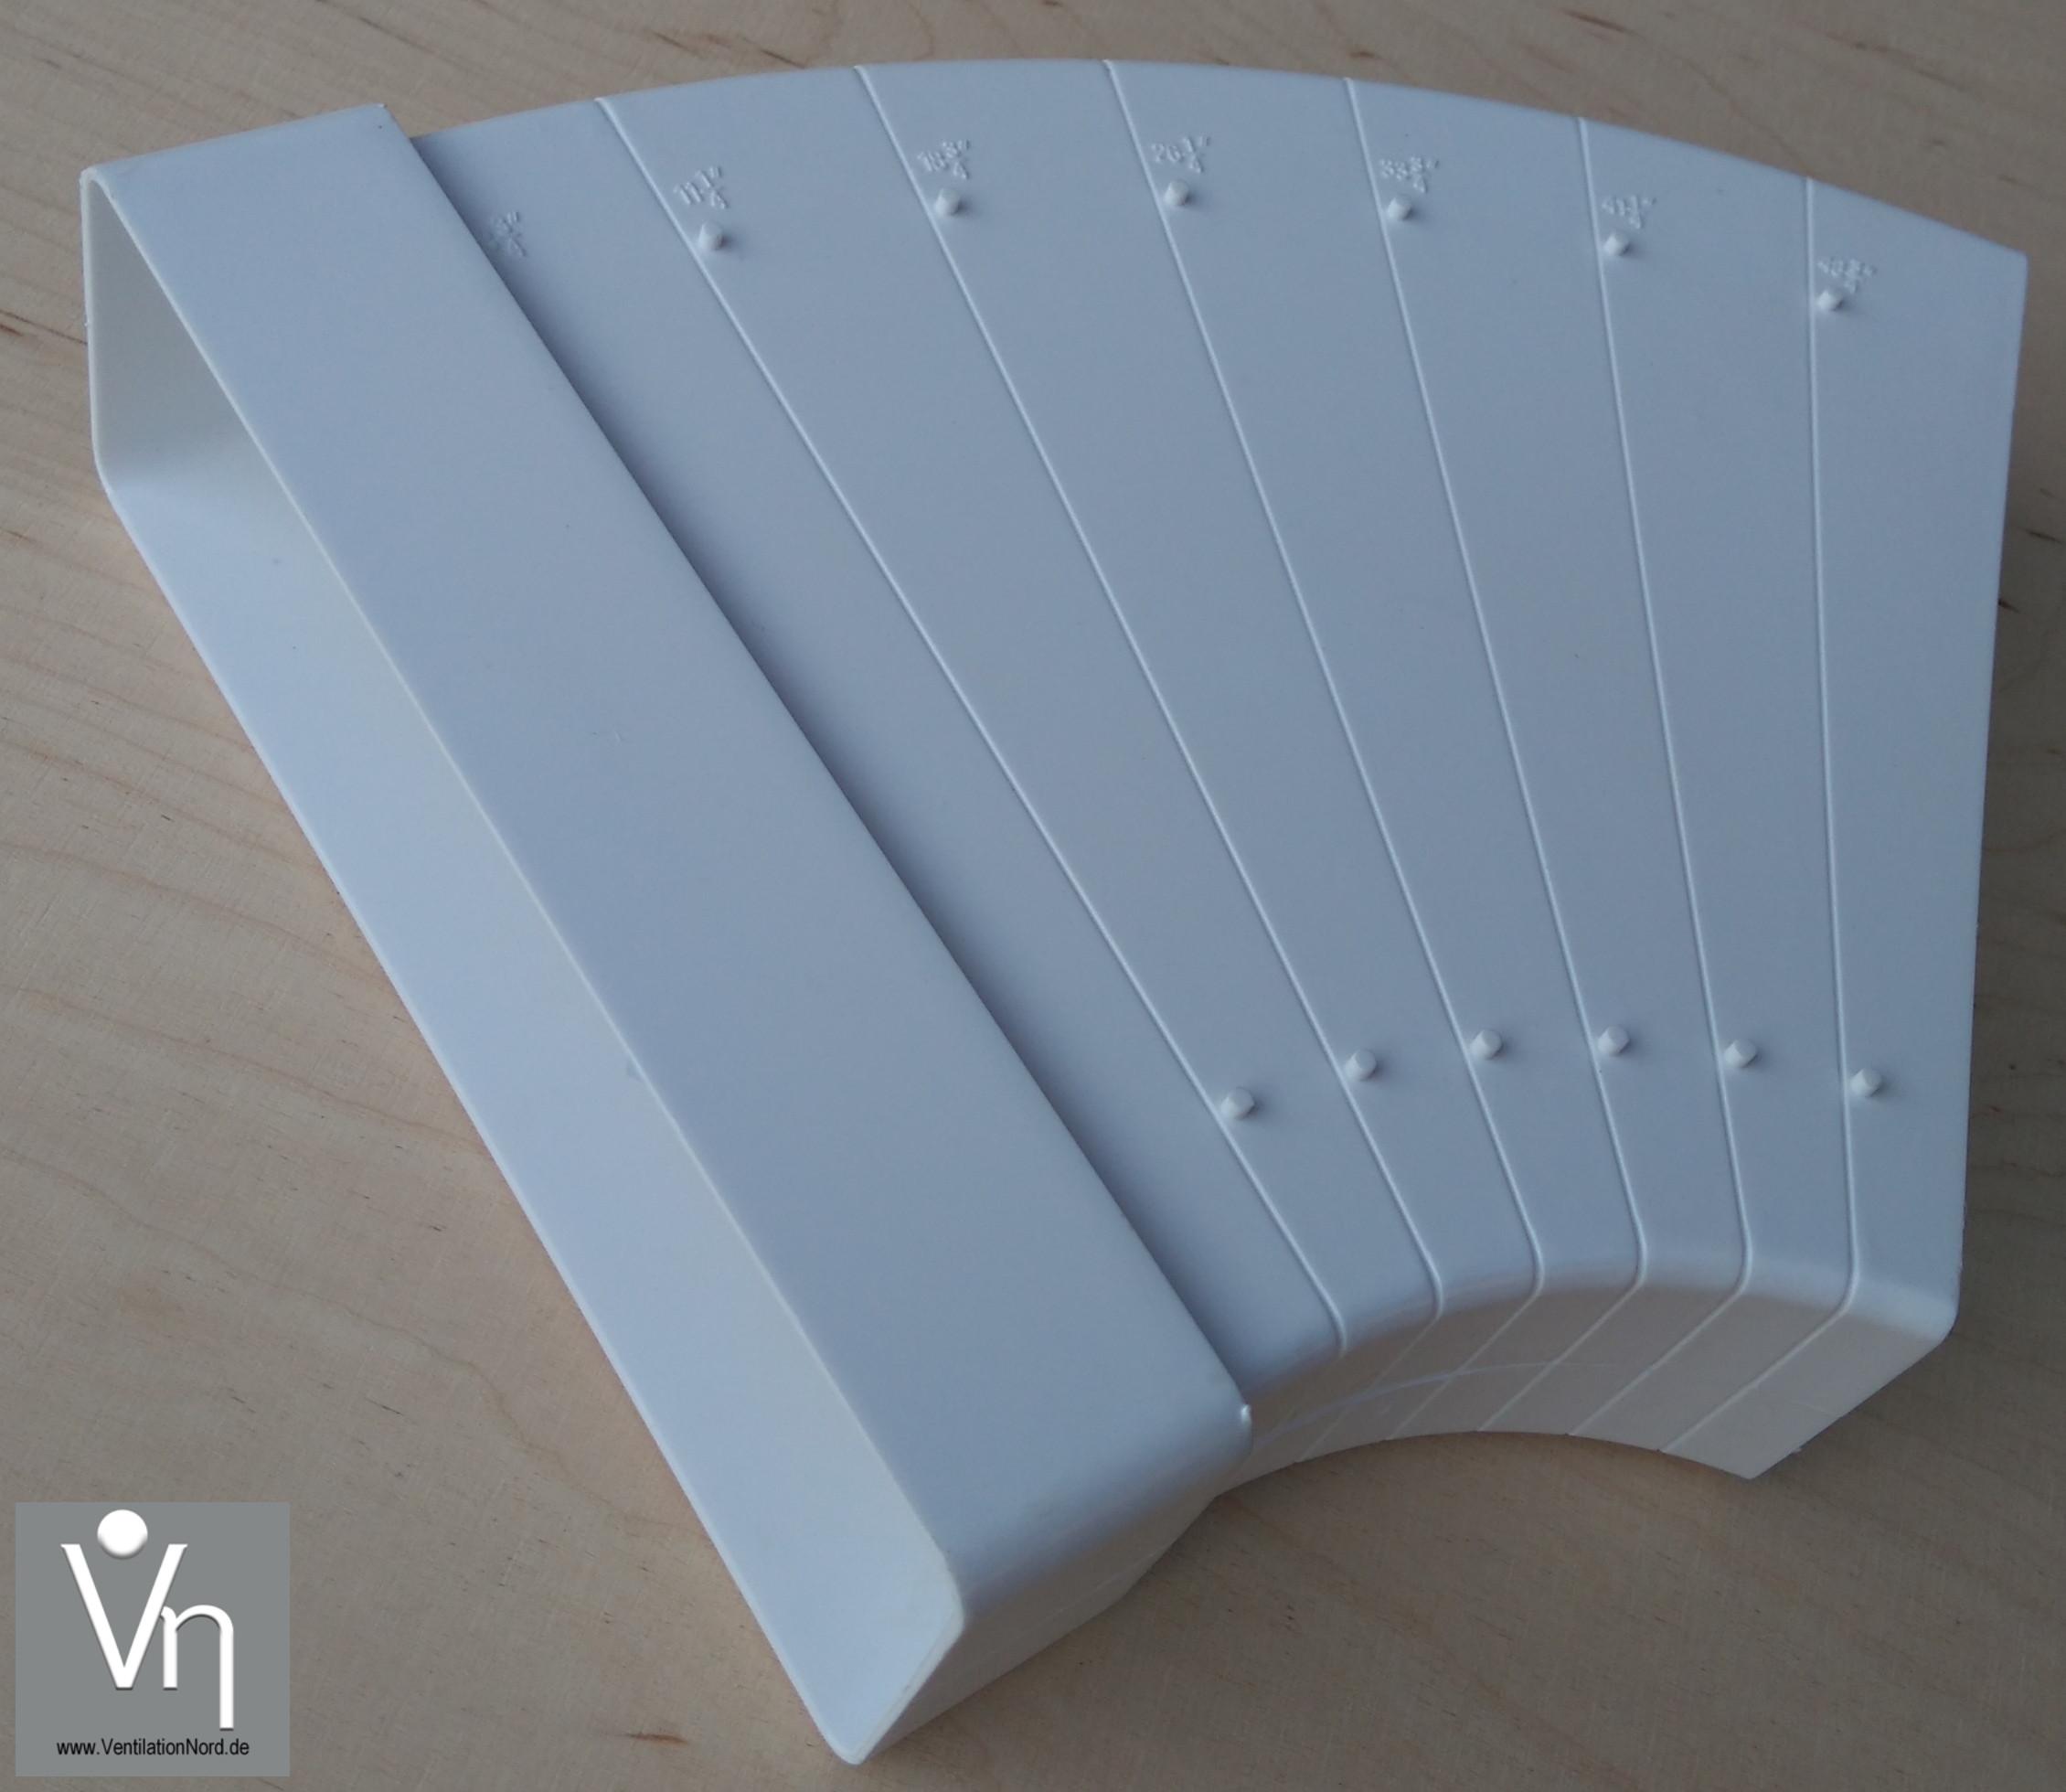 Gut bekannt Abluftkanal 60x205mm Dunstabzug Flachkanal Bogen 7,5° bis 45 XZ44